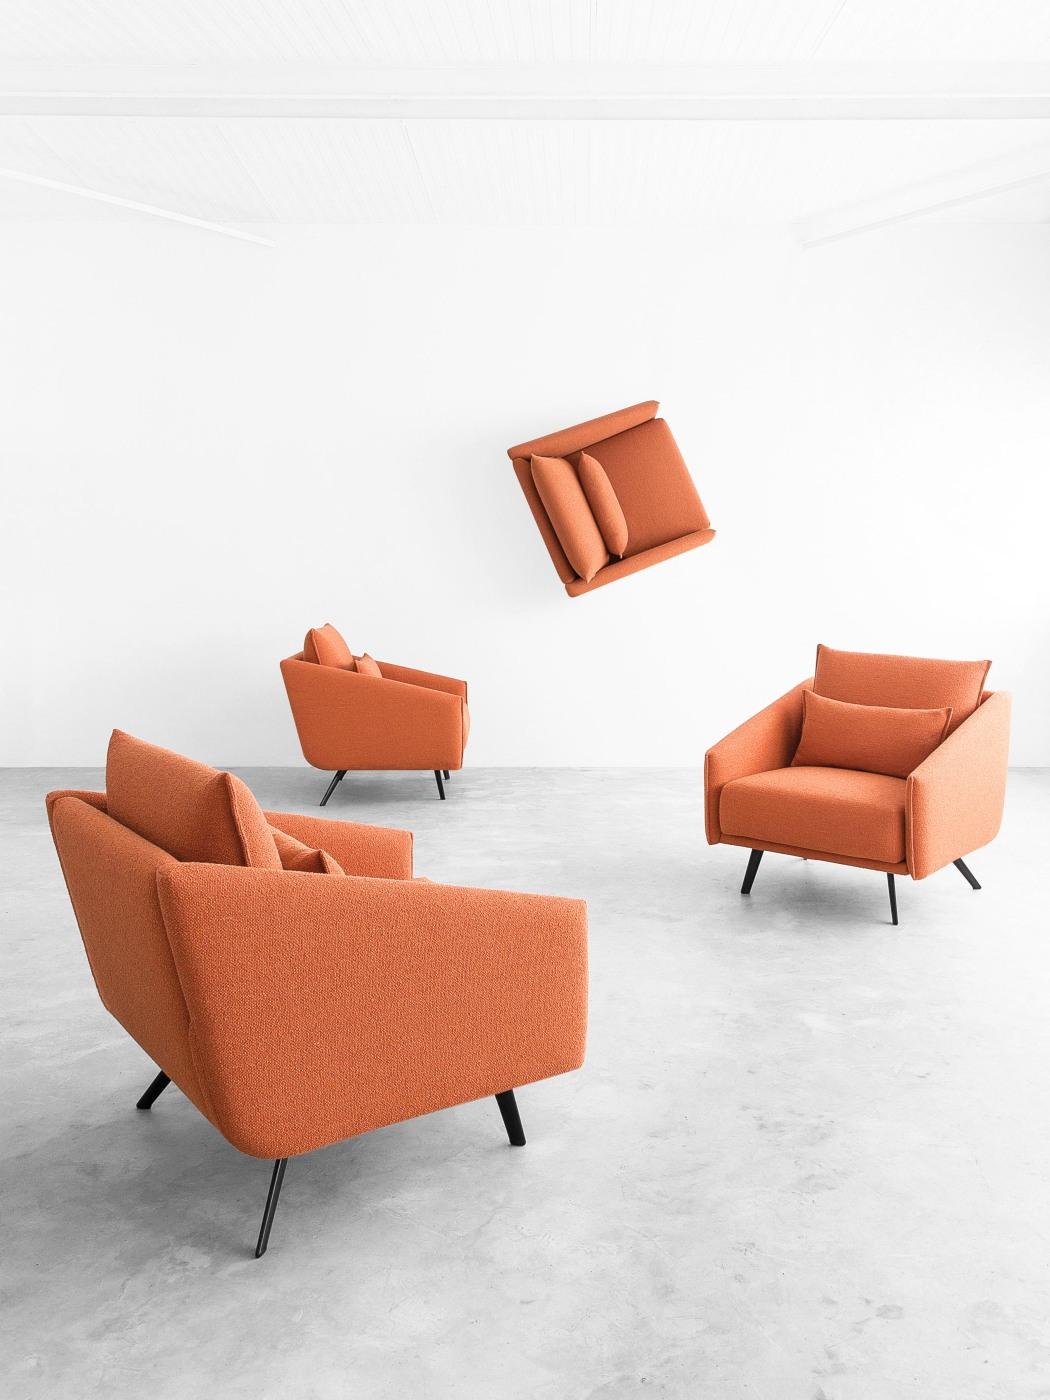 stua costura sofa oficina